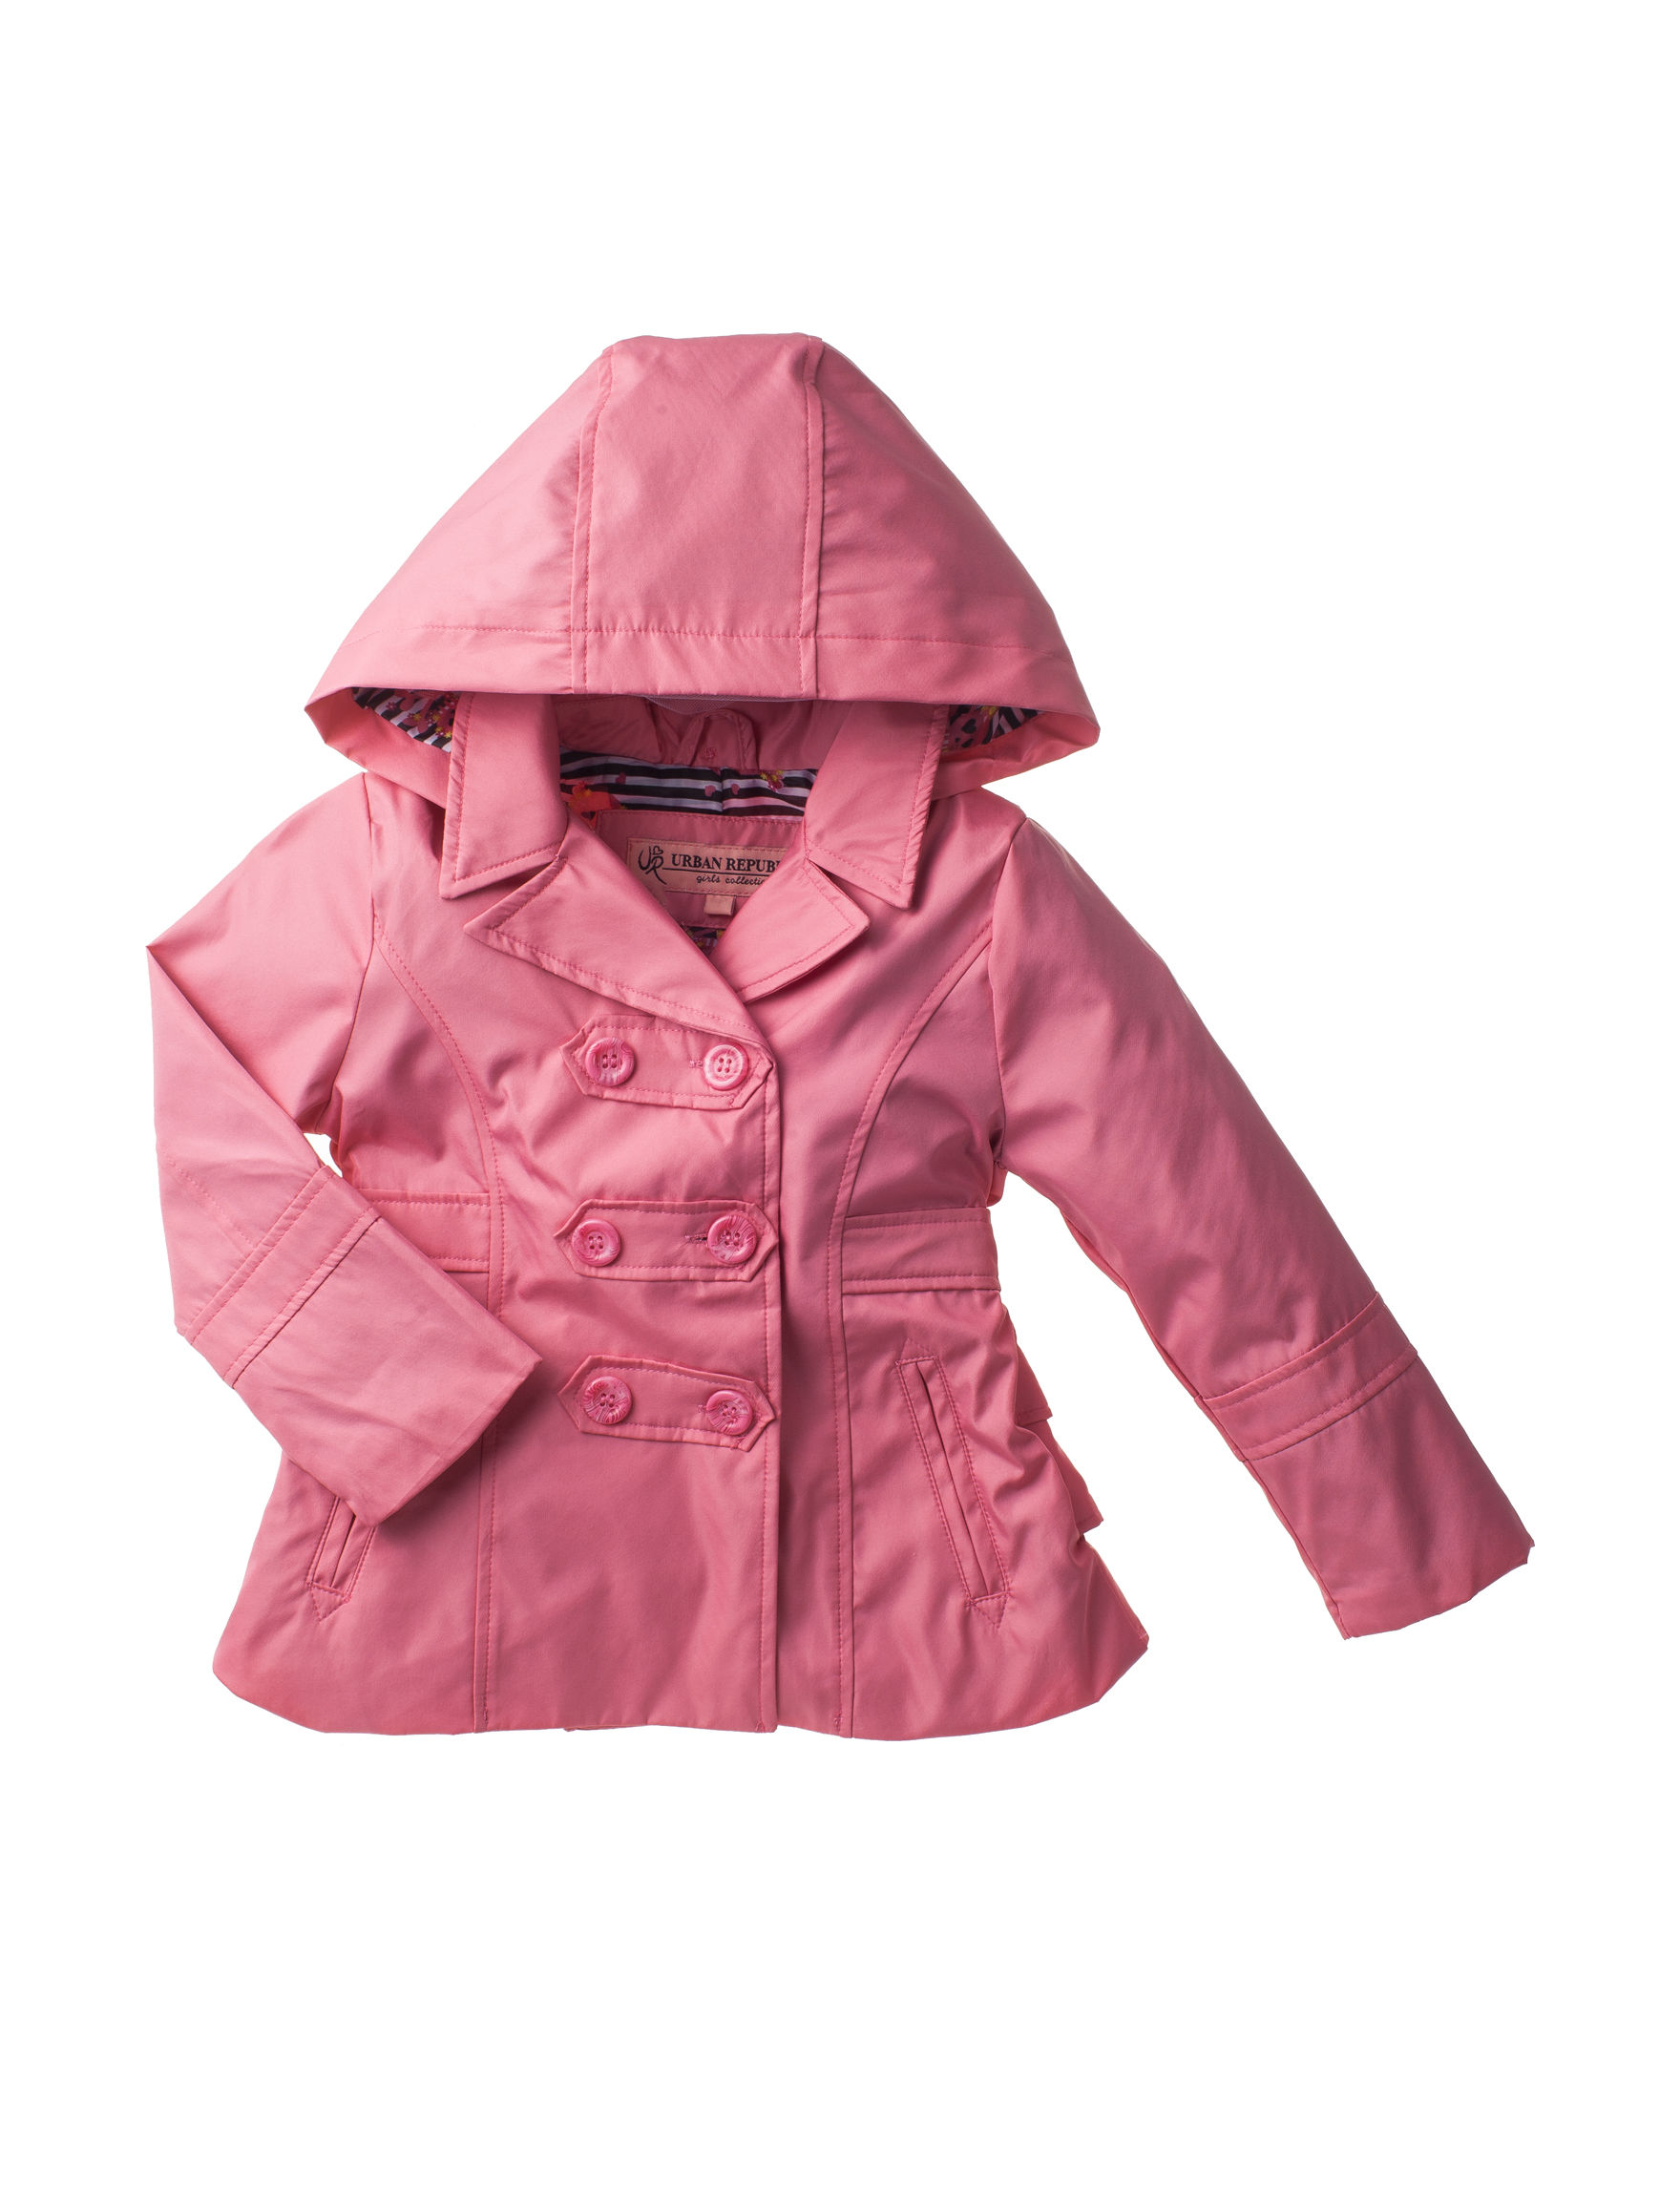 Urban Republic Pink Lemonade Fleece & Soft Shell Jackets